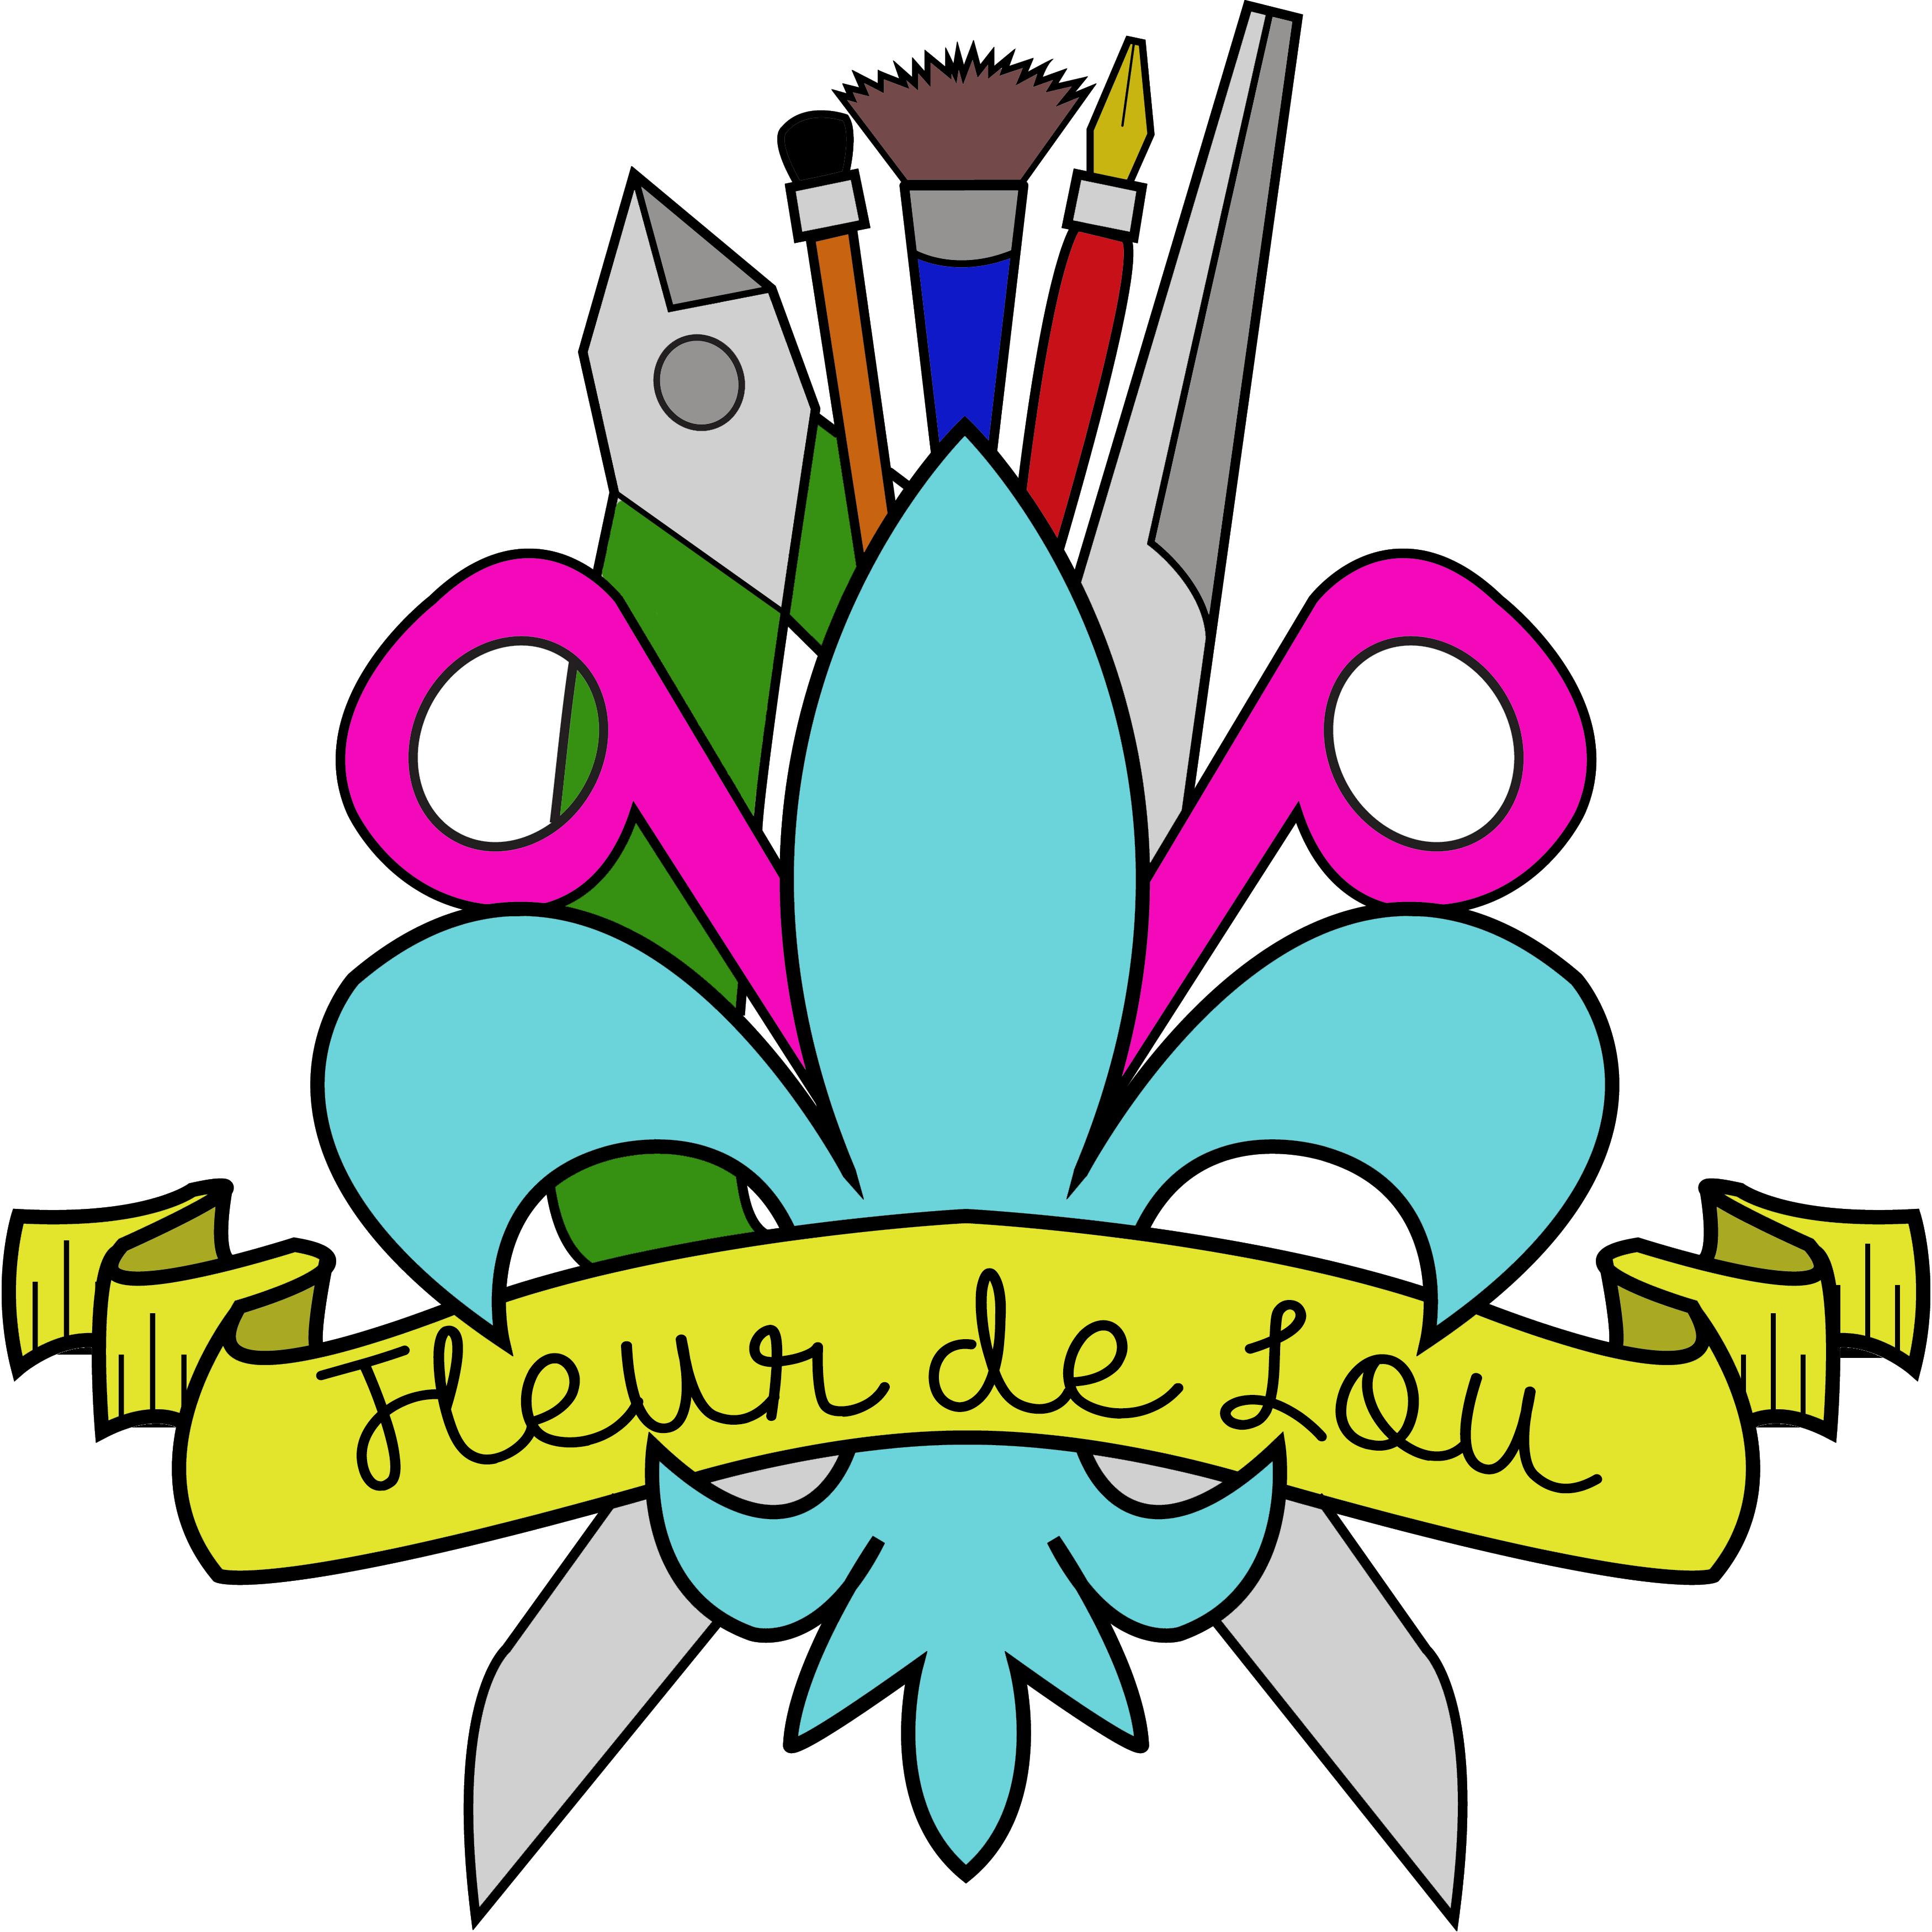 Fleur de Lou